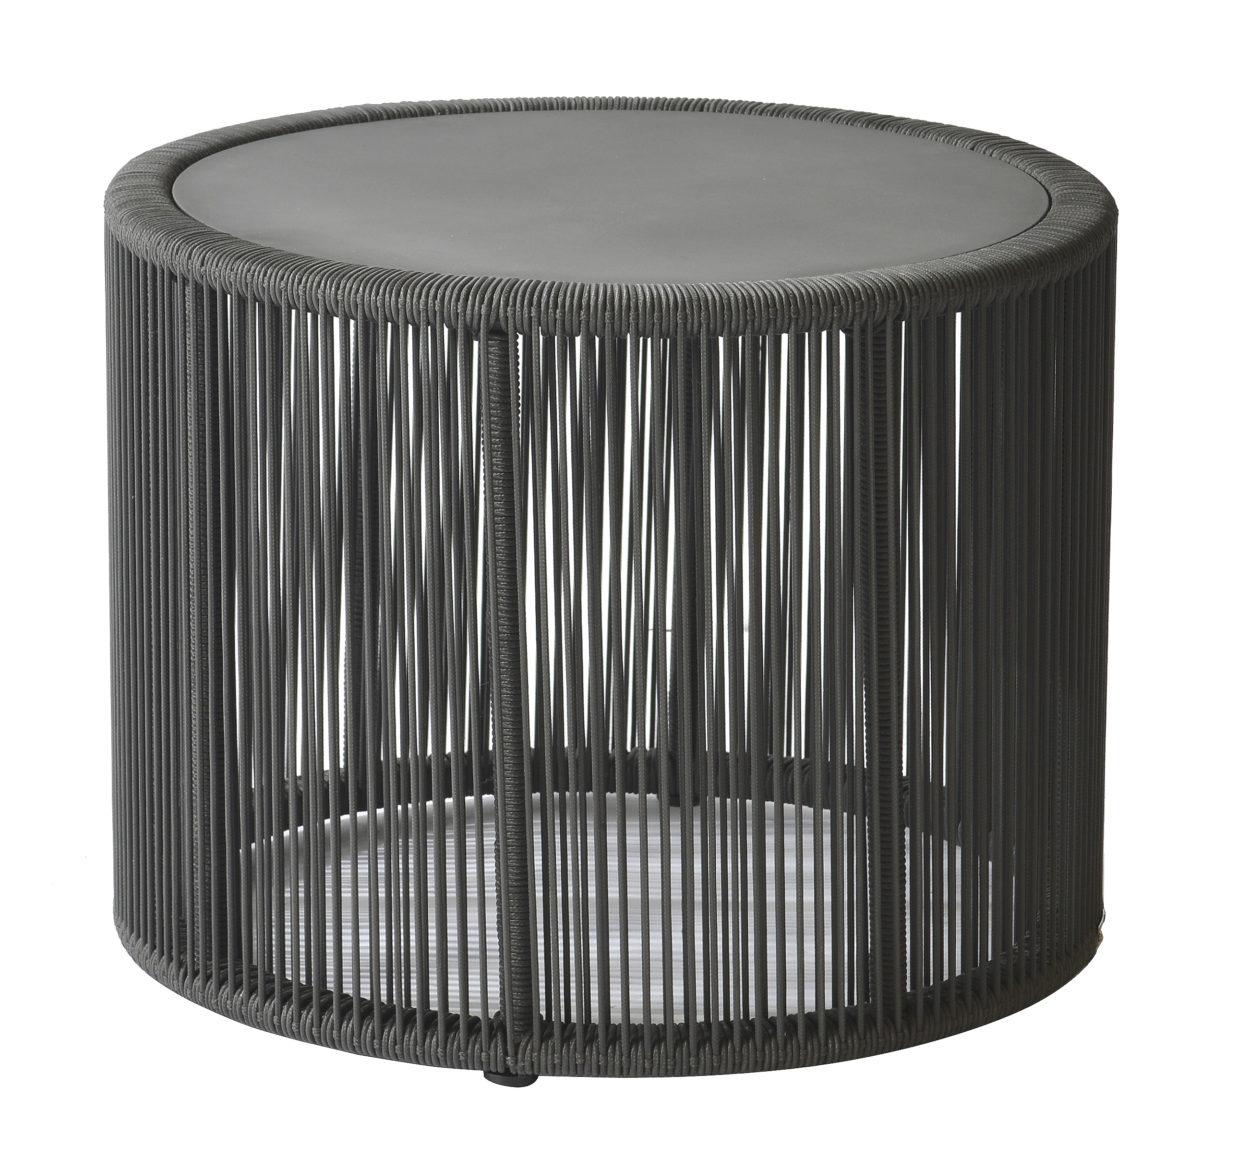 Borek Lagos Side Table Dark Grey Rope 59x45.5 cm